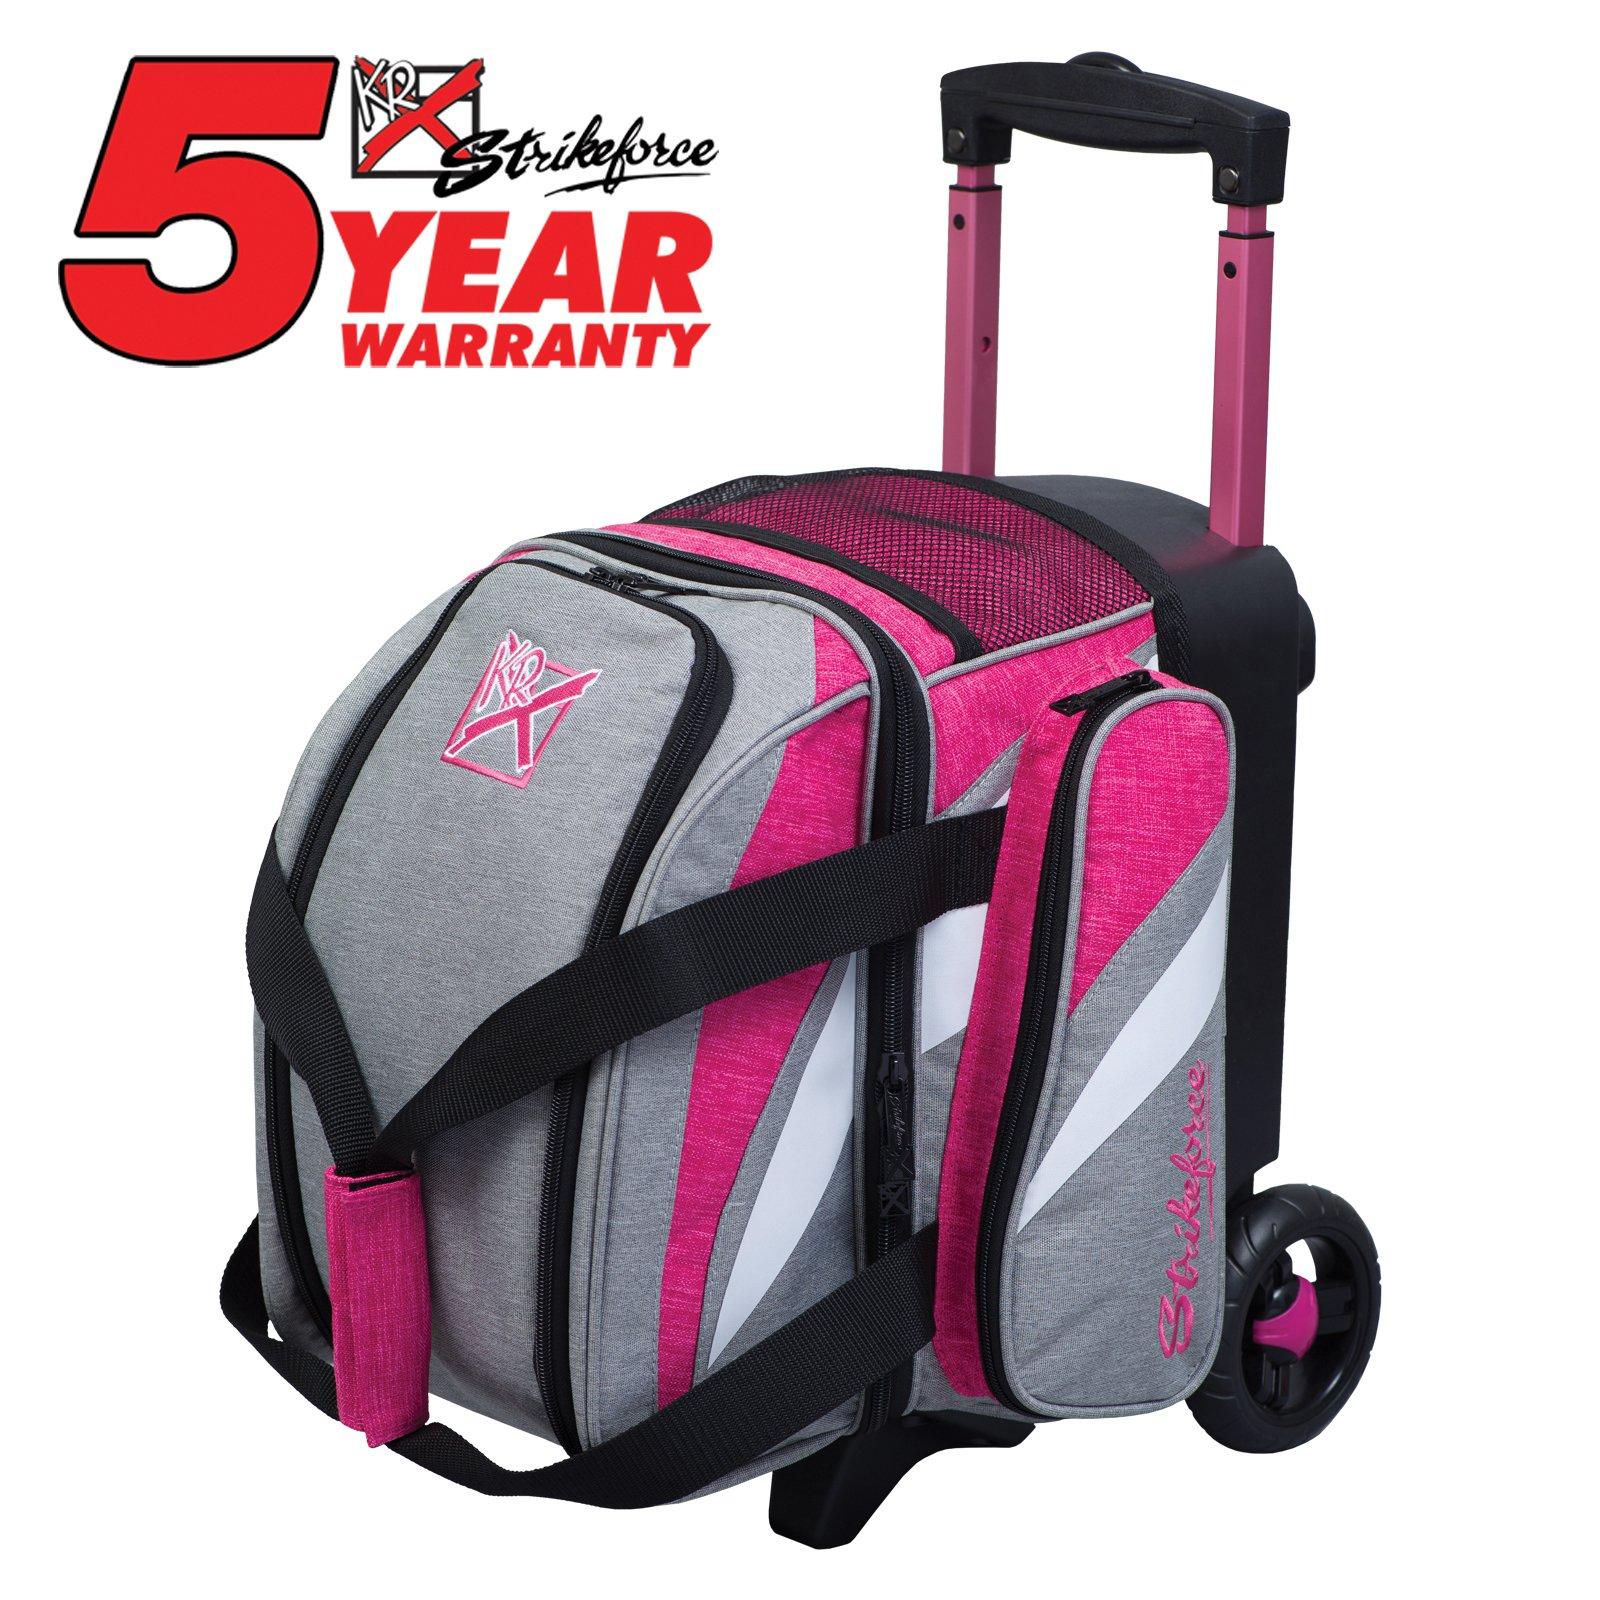 KR Strikeforce Bowling Cruiser Single Bowling Ball Roller Bag (Stone/Pink) by KR Strikeforce Bowling